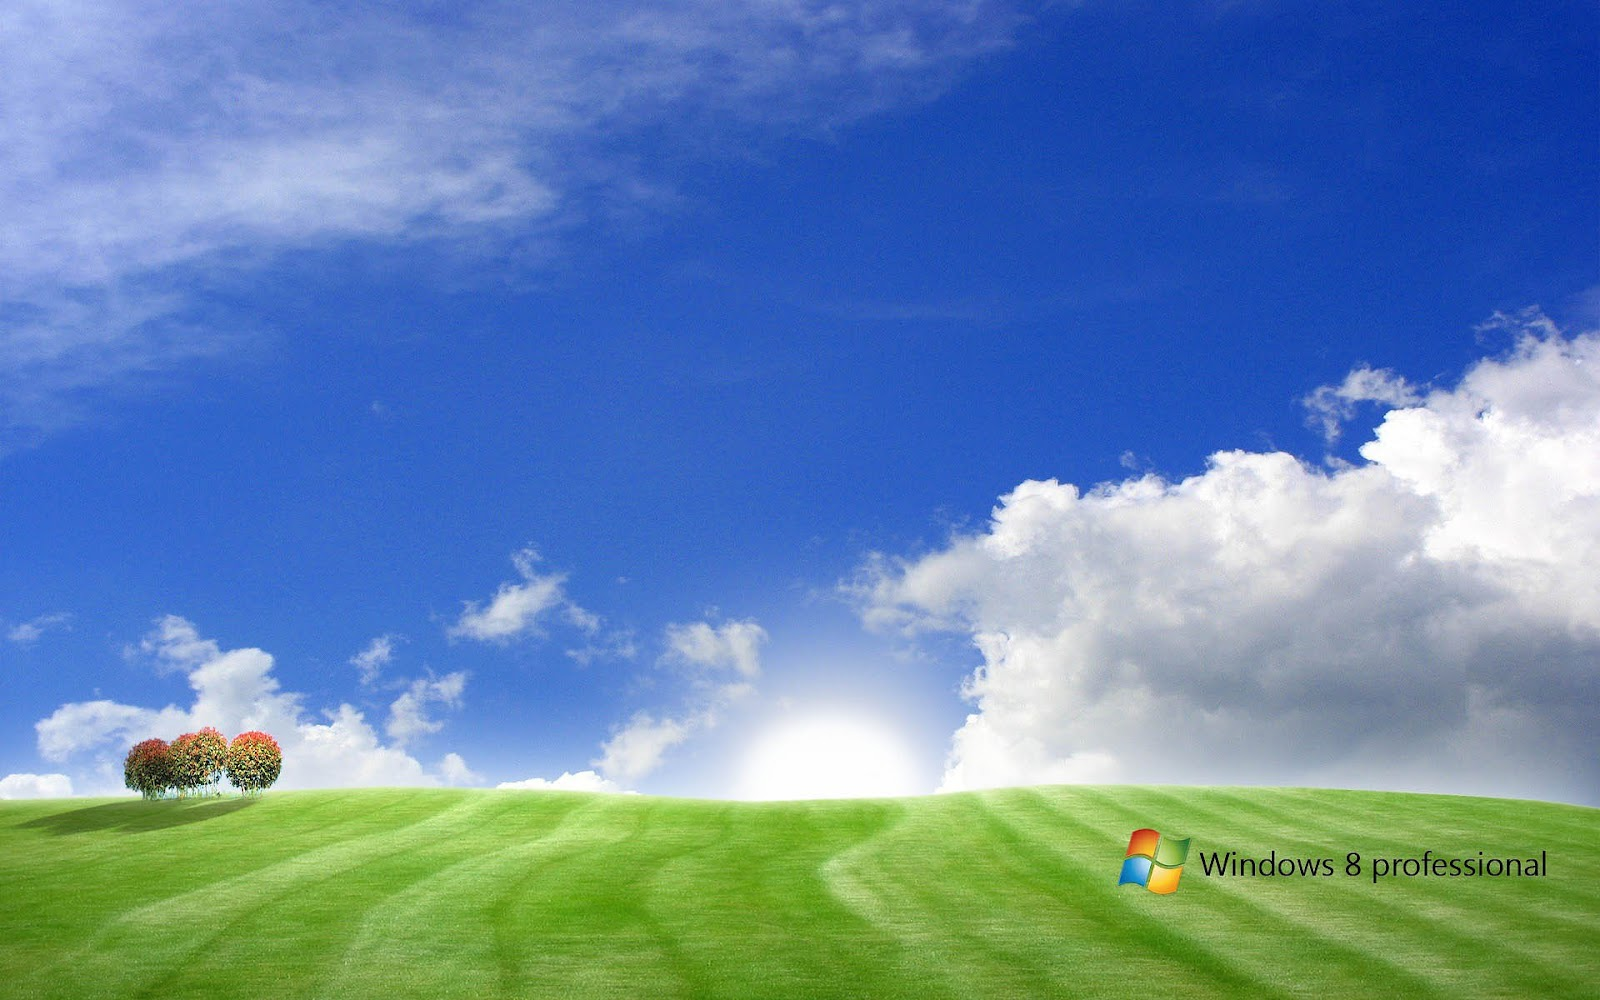 http://2.bp.blogspot.com/-cCXfubBb_vA/UC9V37YH8pI/AAAAAAAAFXw/vLaXSDiZWXo/s1600/hd-landschap-windows-8-wallpaper-met-gras-blauwe-lucht-wolken-en-windows-8-tekst-achtergrond.jpg